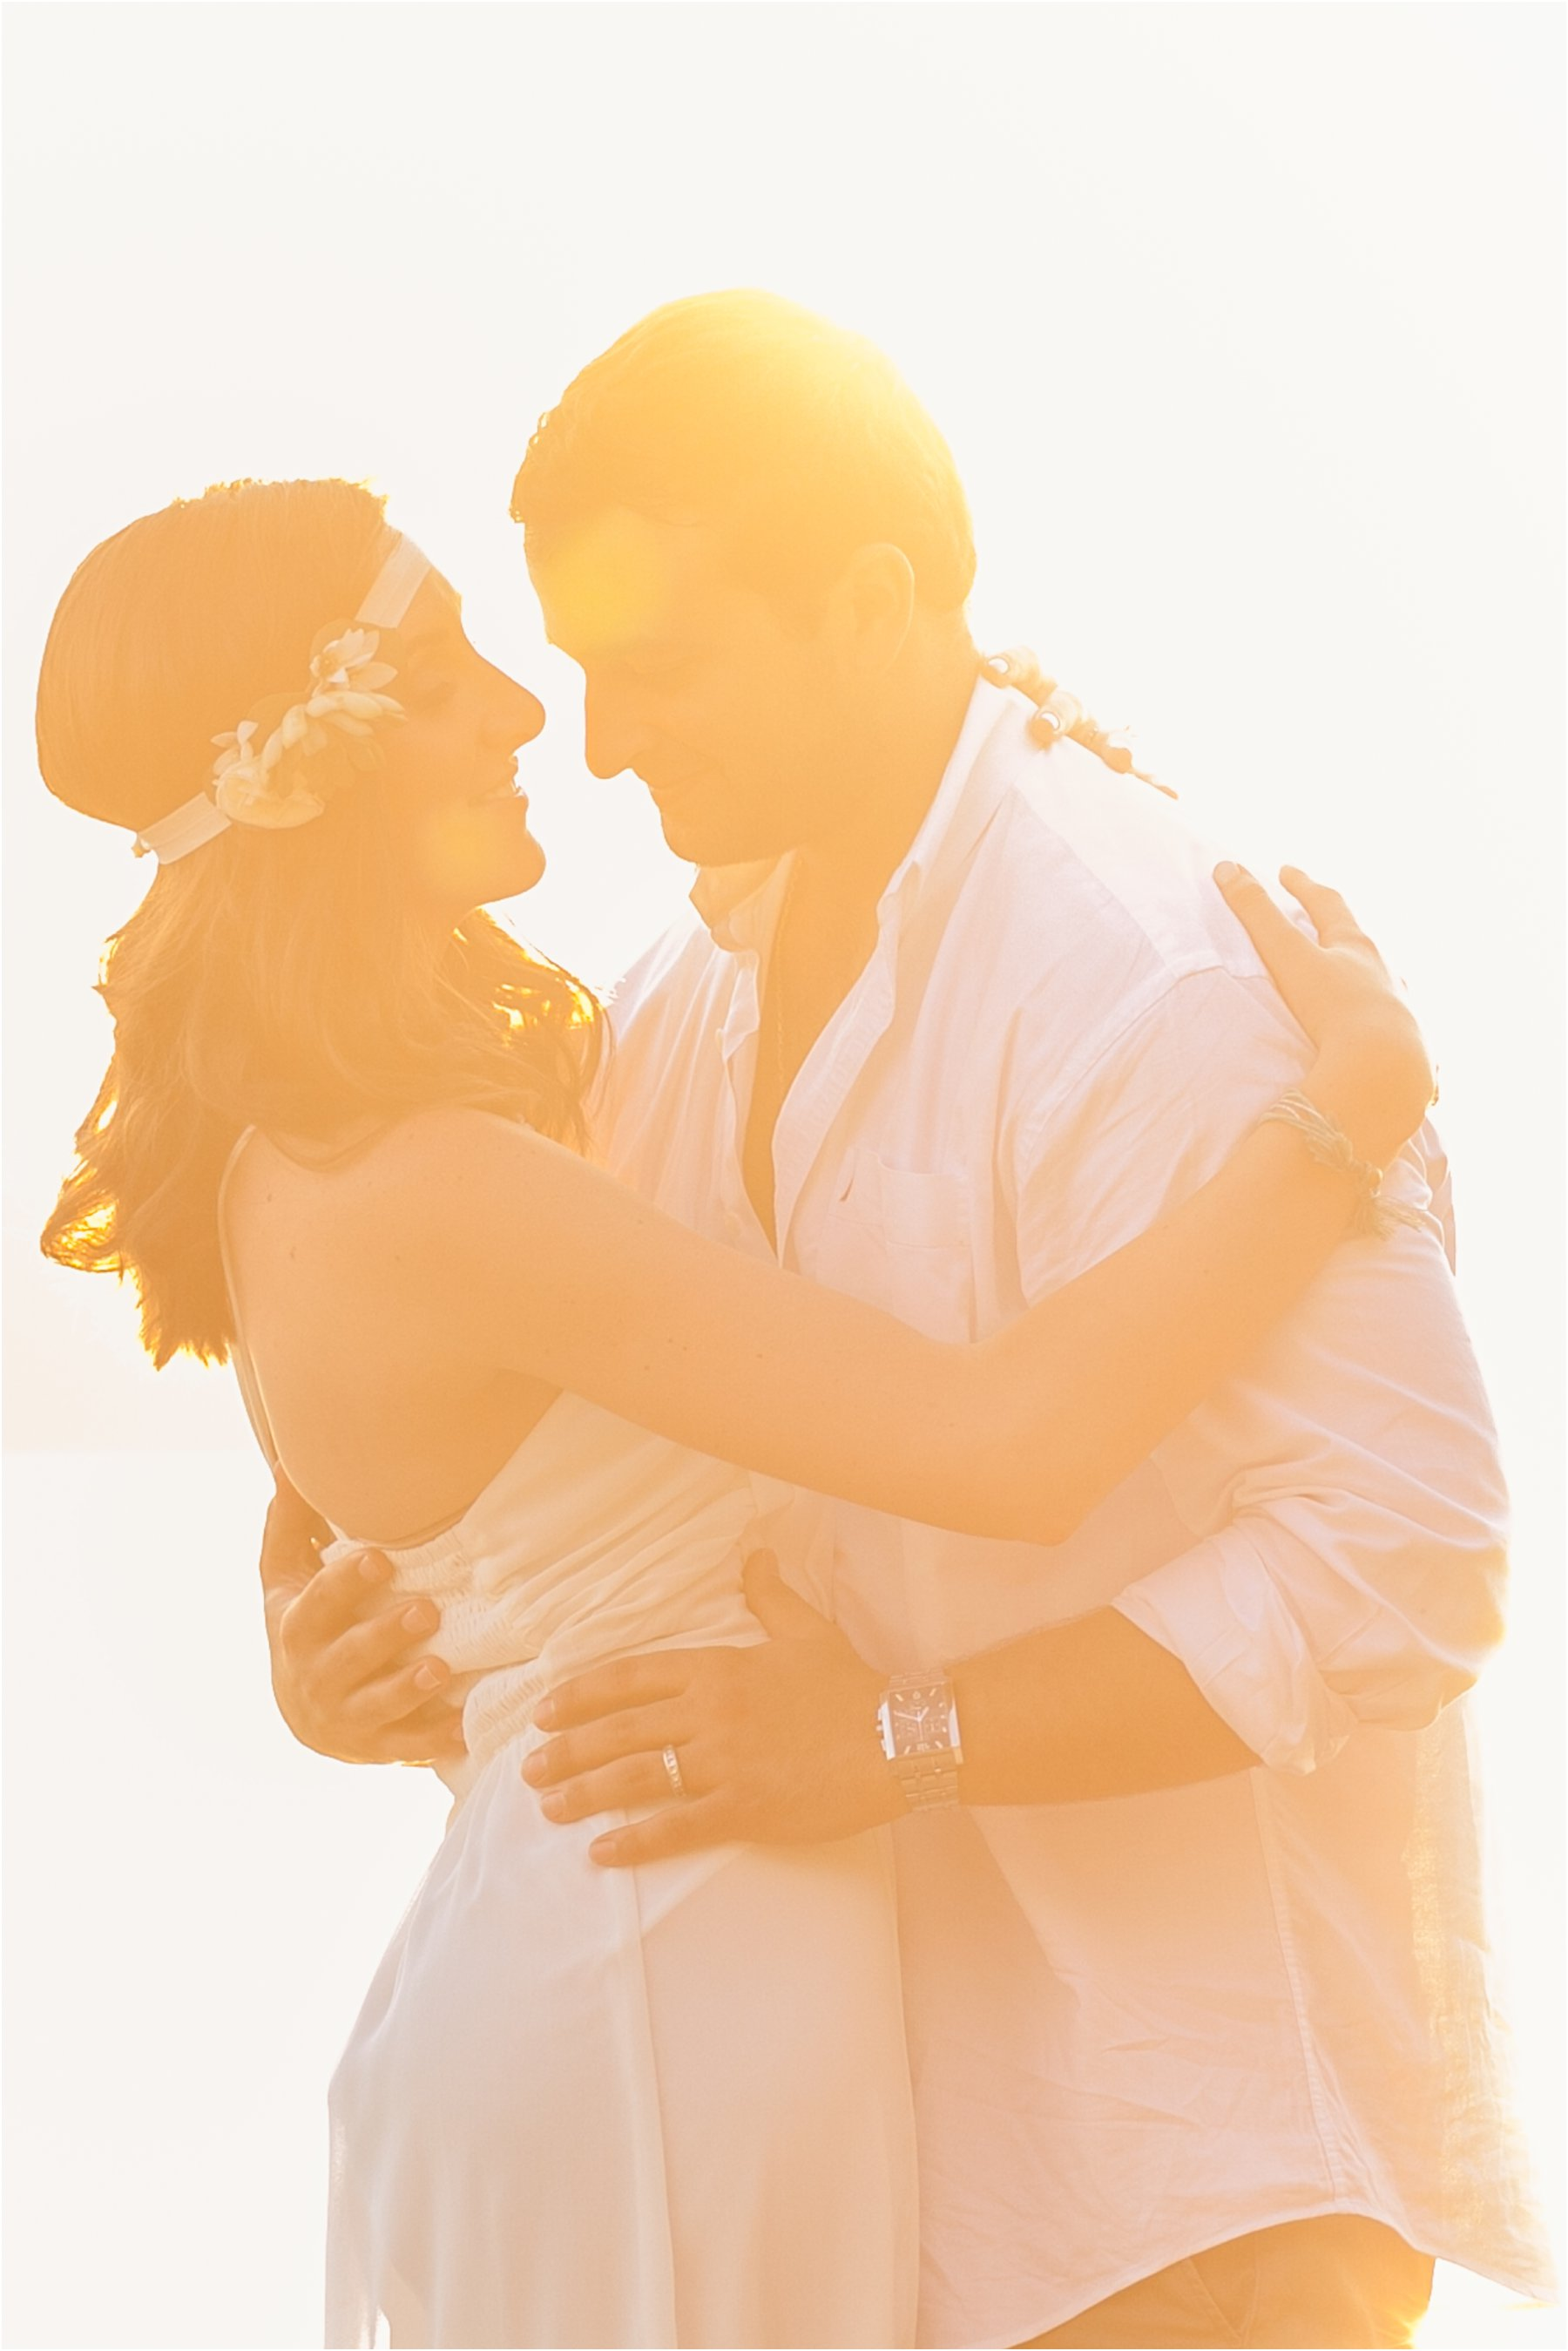 first_landing_wedding_boho_wedding_photography_virginia_Jessica_ryan_photography_0211